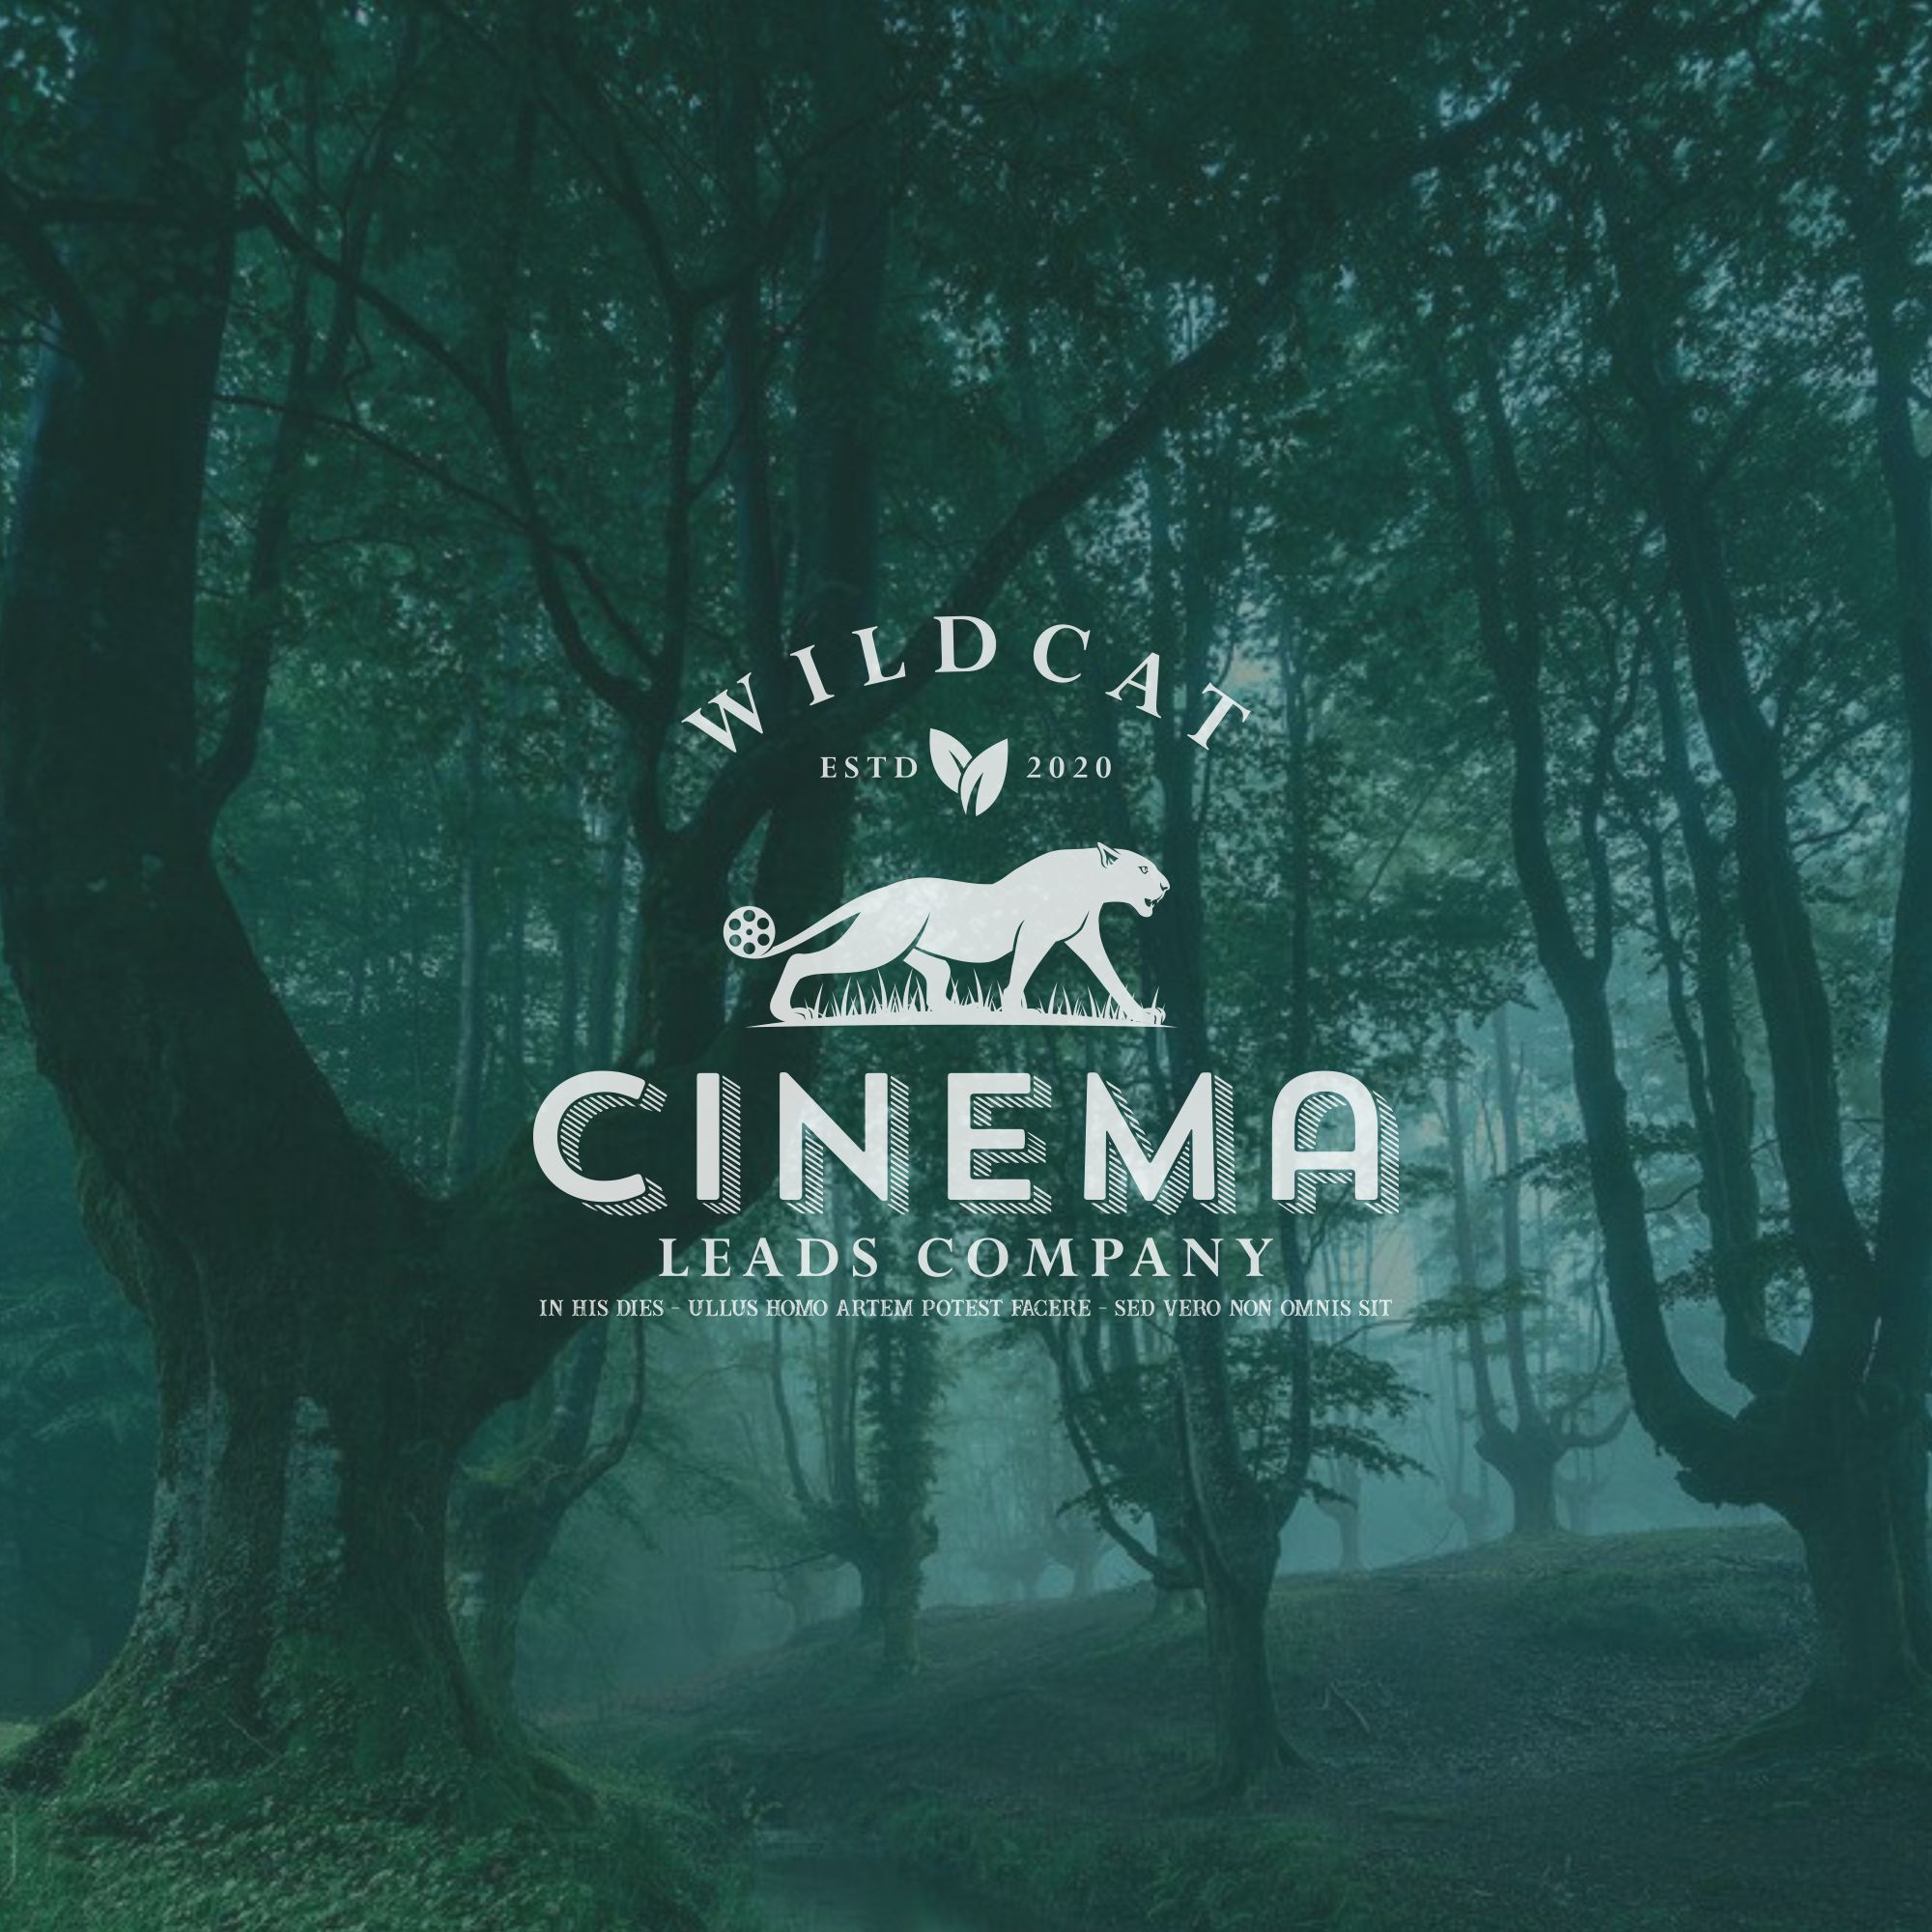 Wildcat Cinema Leads